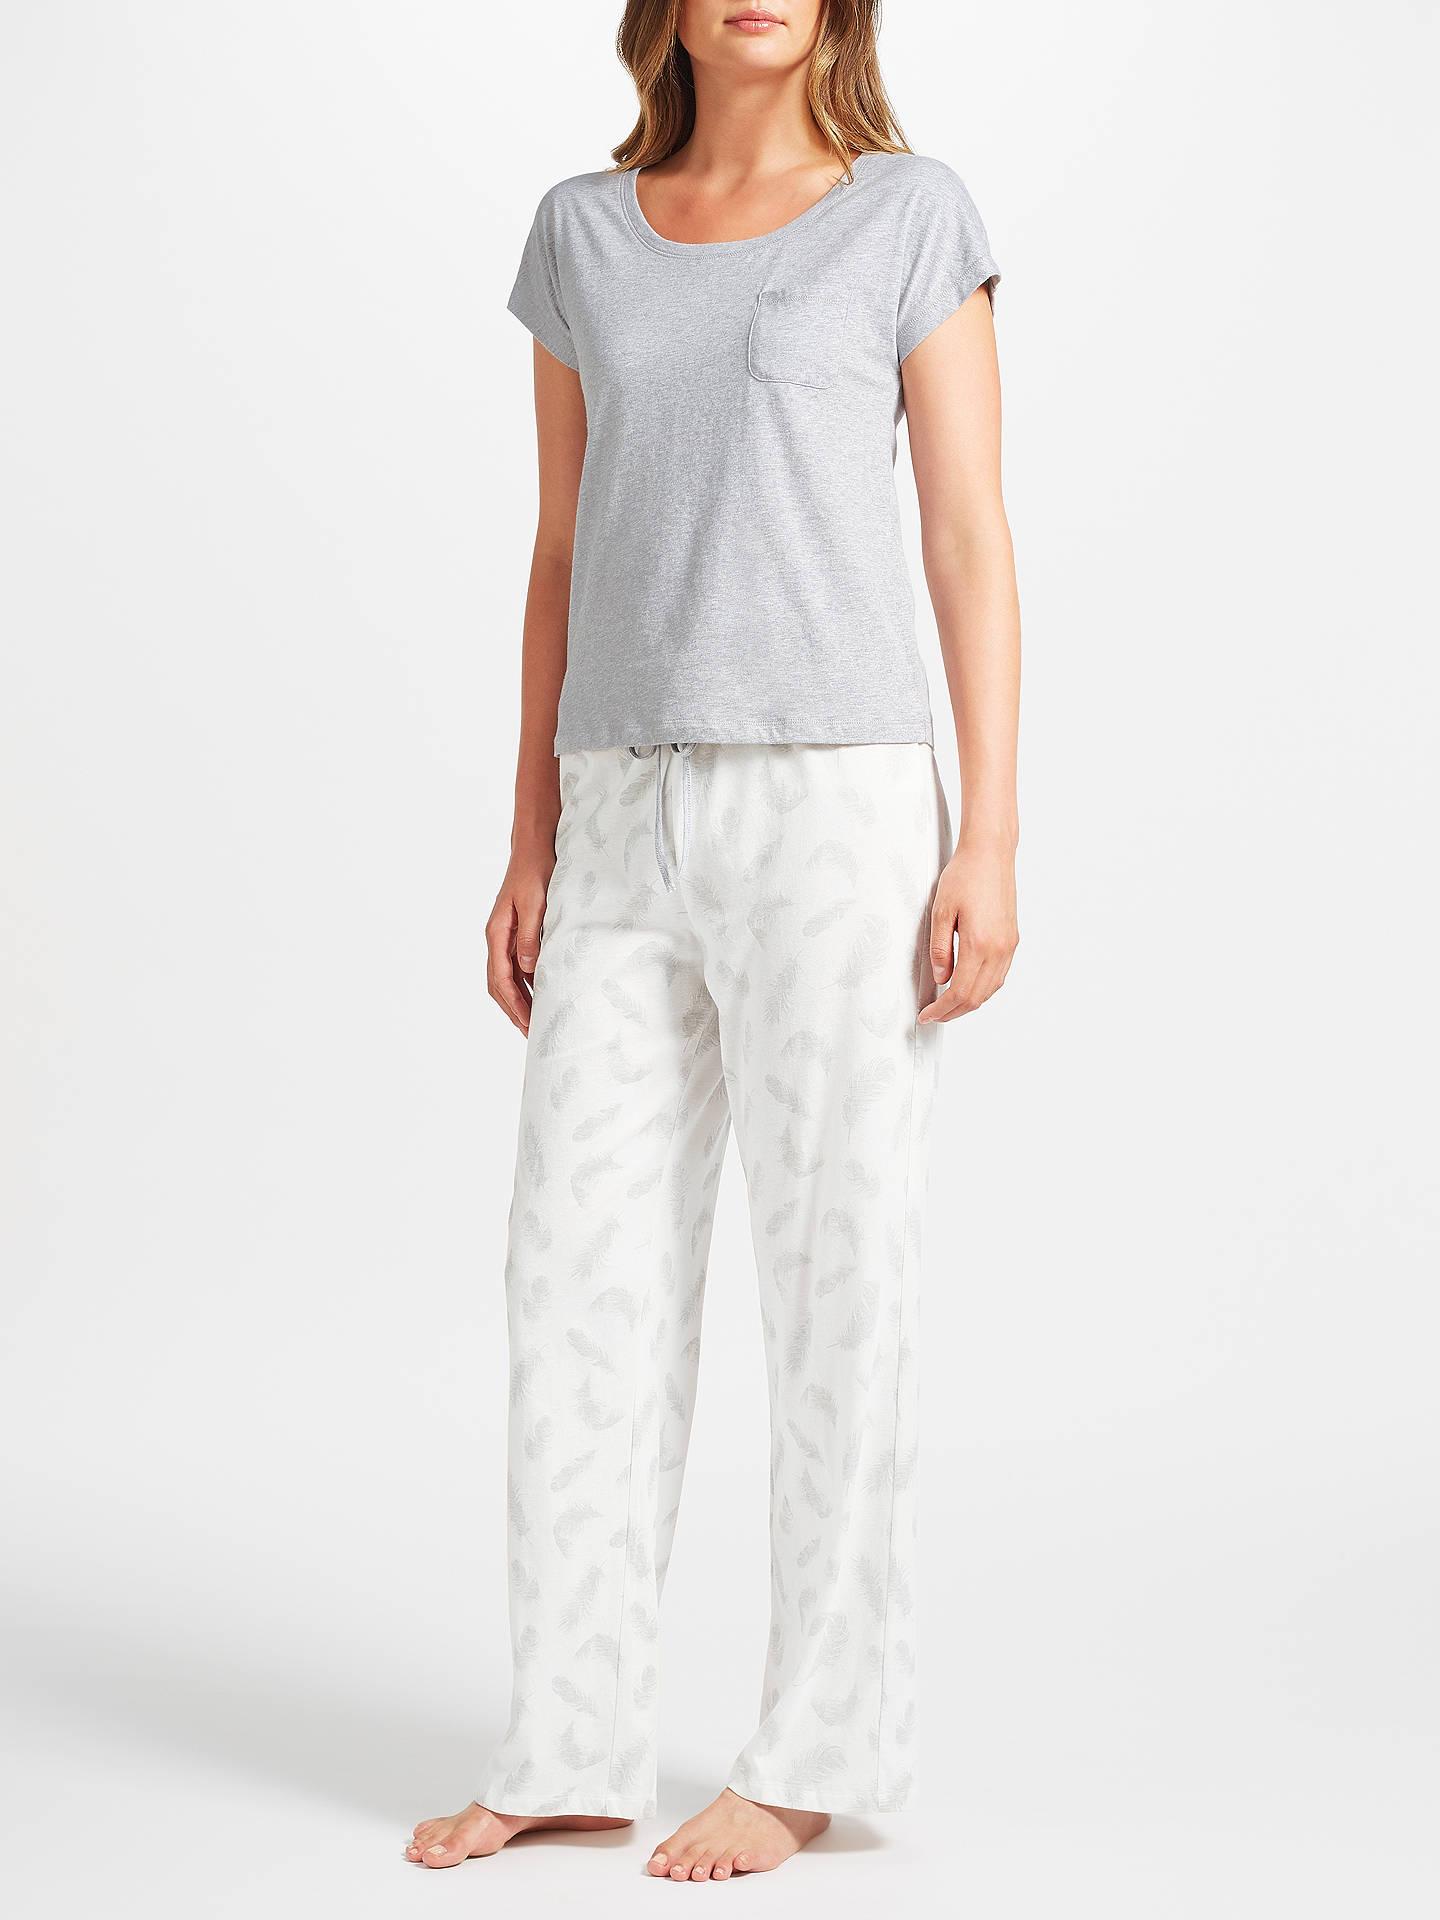 5f9c21c9ad BuyJohn Lewis Amelia Feather Print Short Sleeve Jersey Pyjama Set